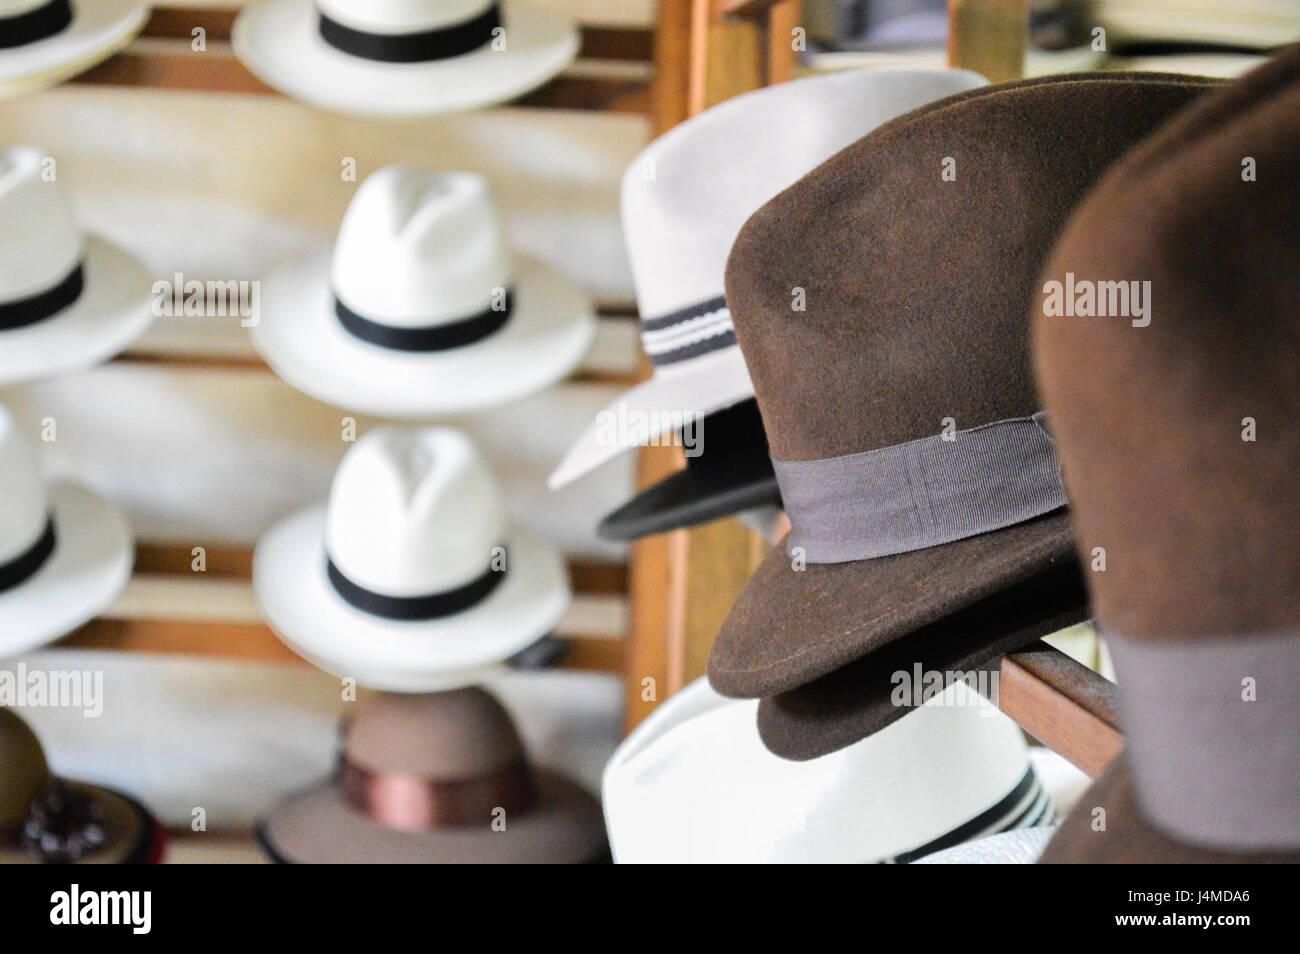 c929984e67e29 Vista de la esquina de la pantalla dentro de un sombrero de Panamá shop  Imagen De